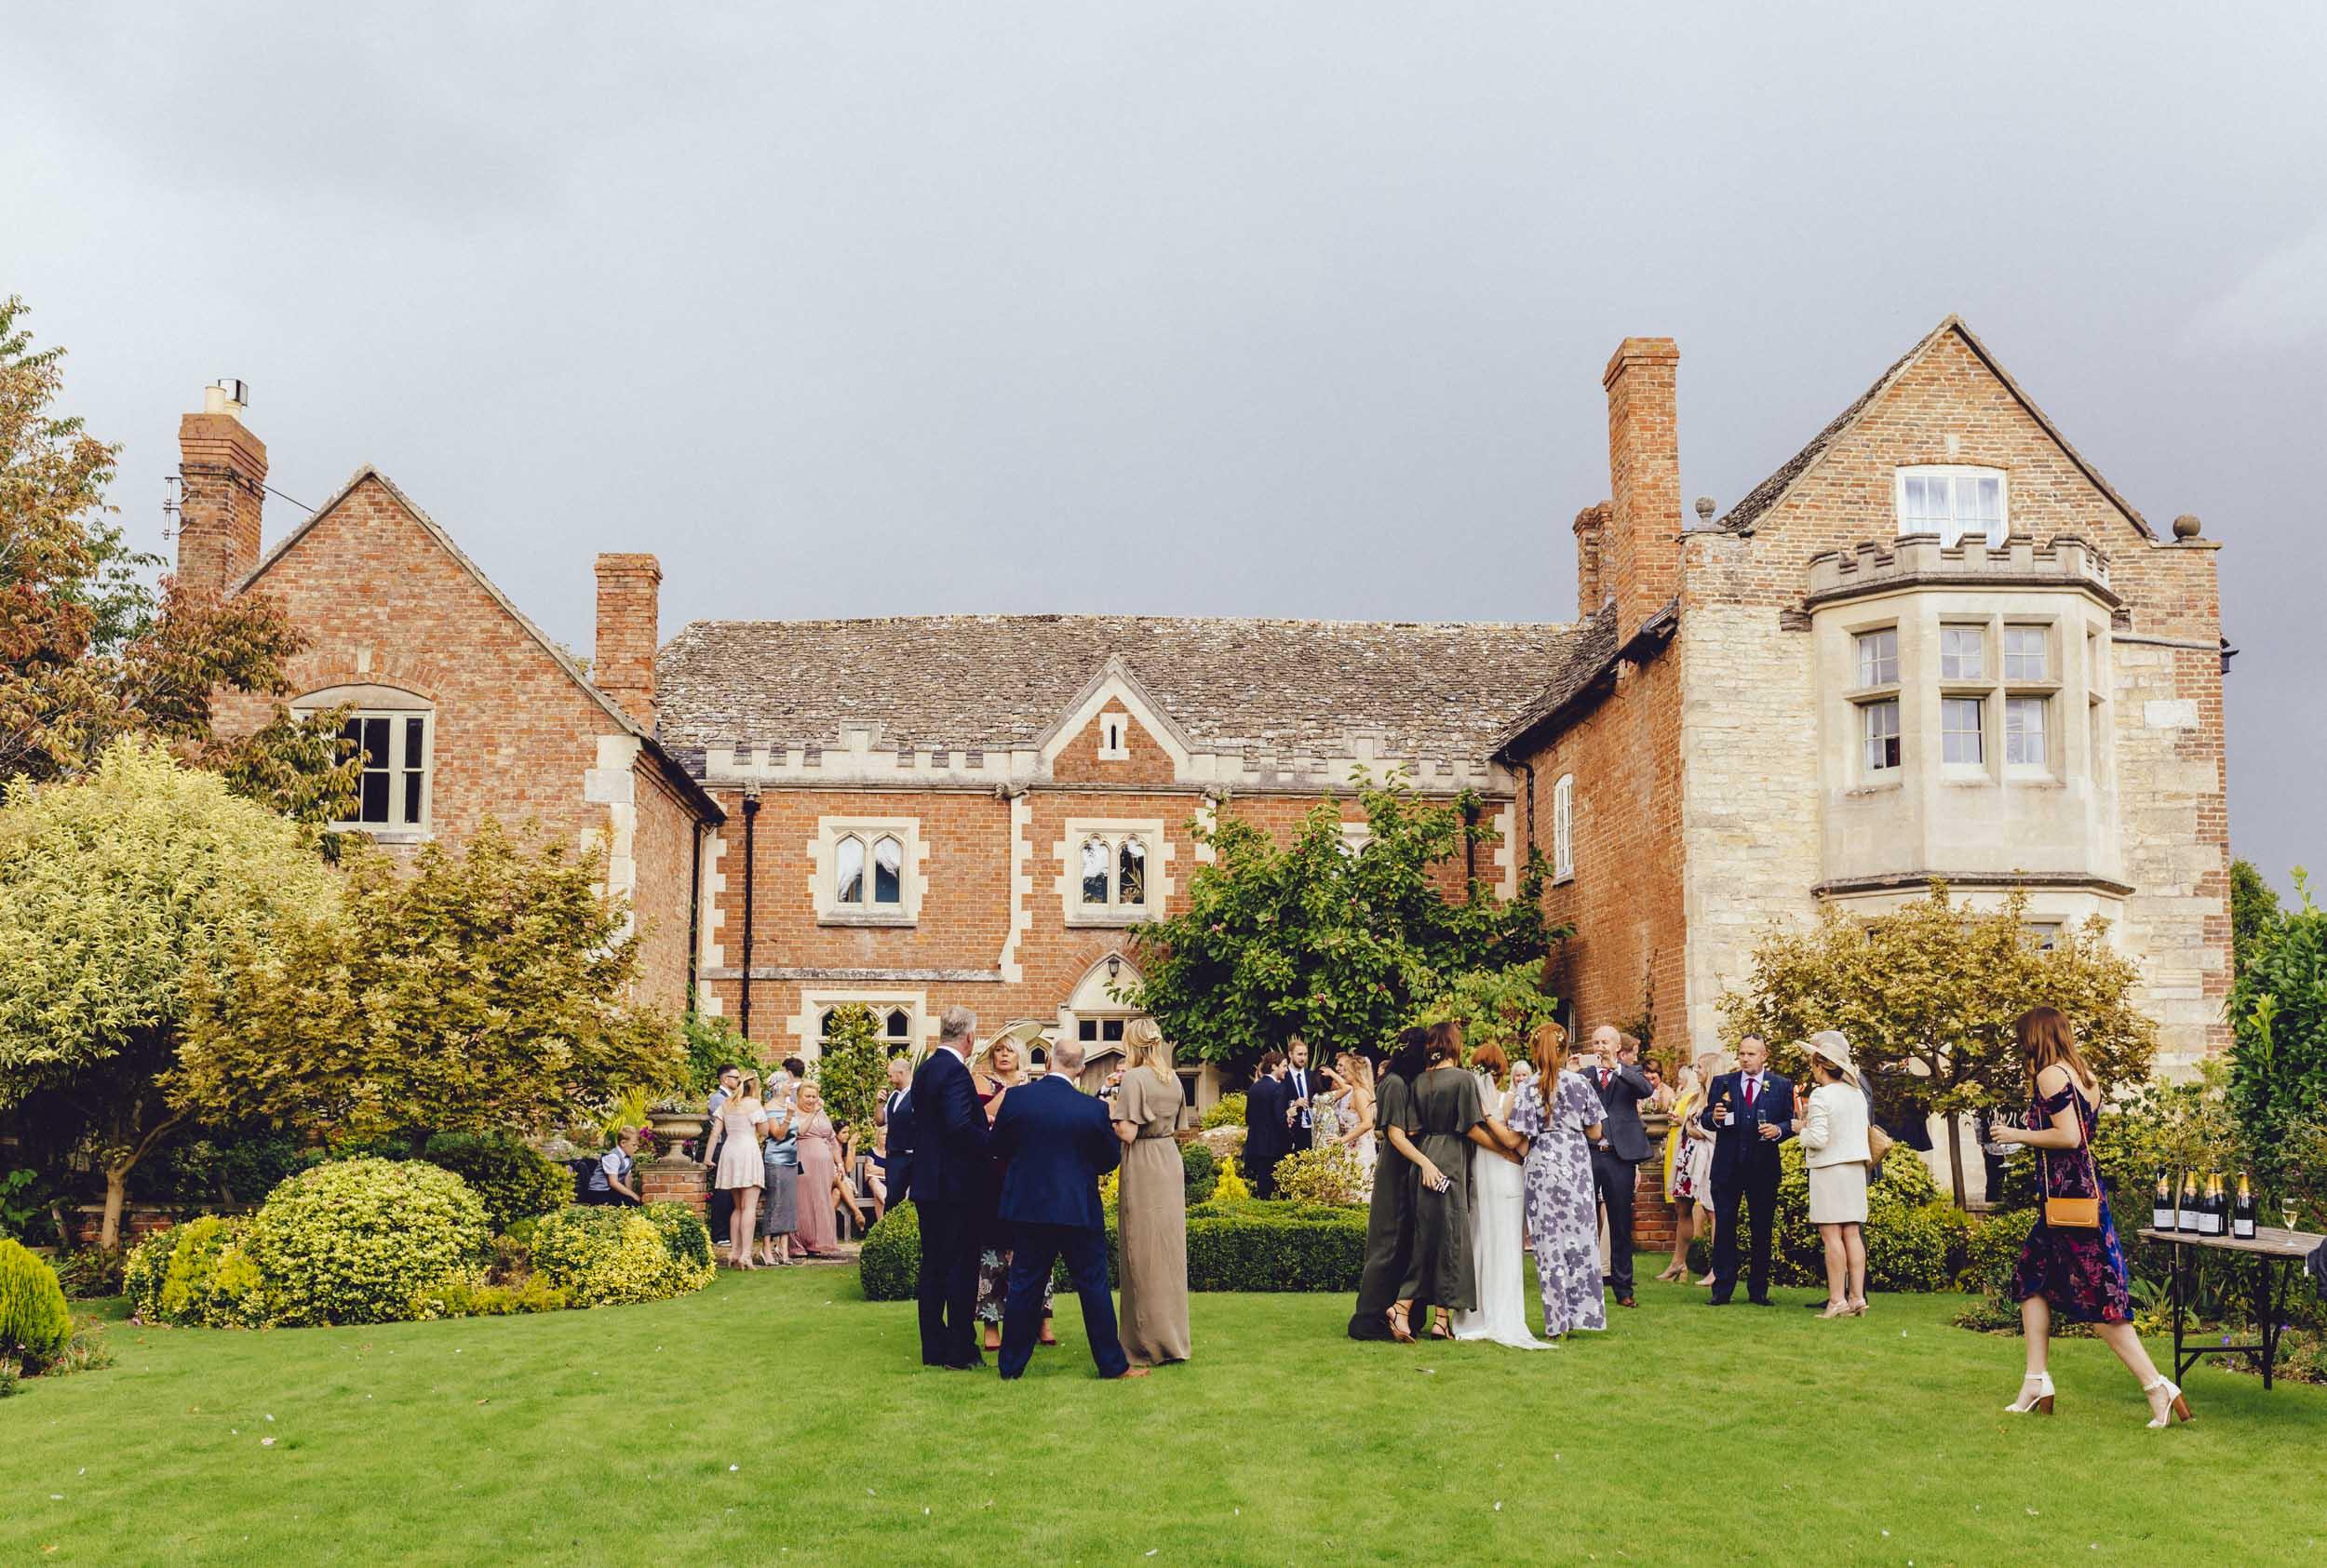 Brockworth court barn-unconventional fun wedding photography043.jpg